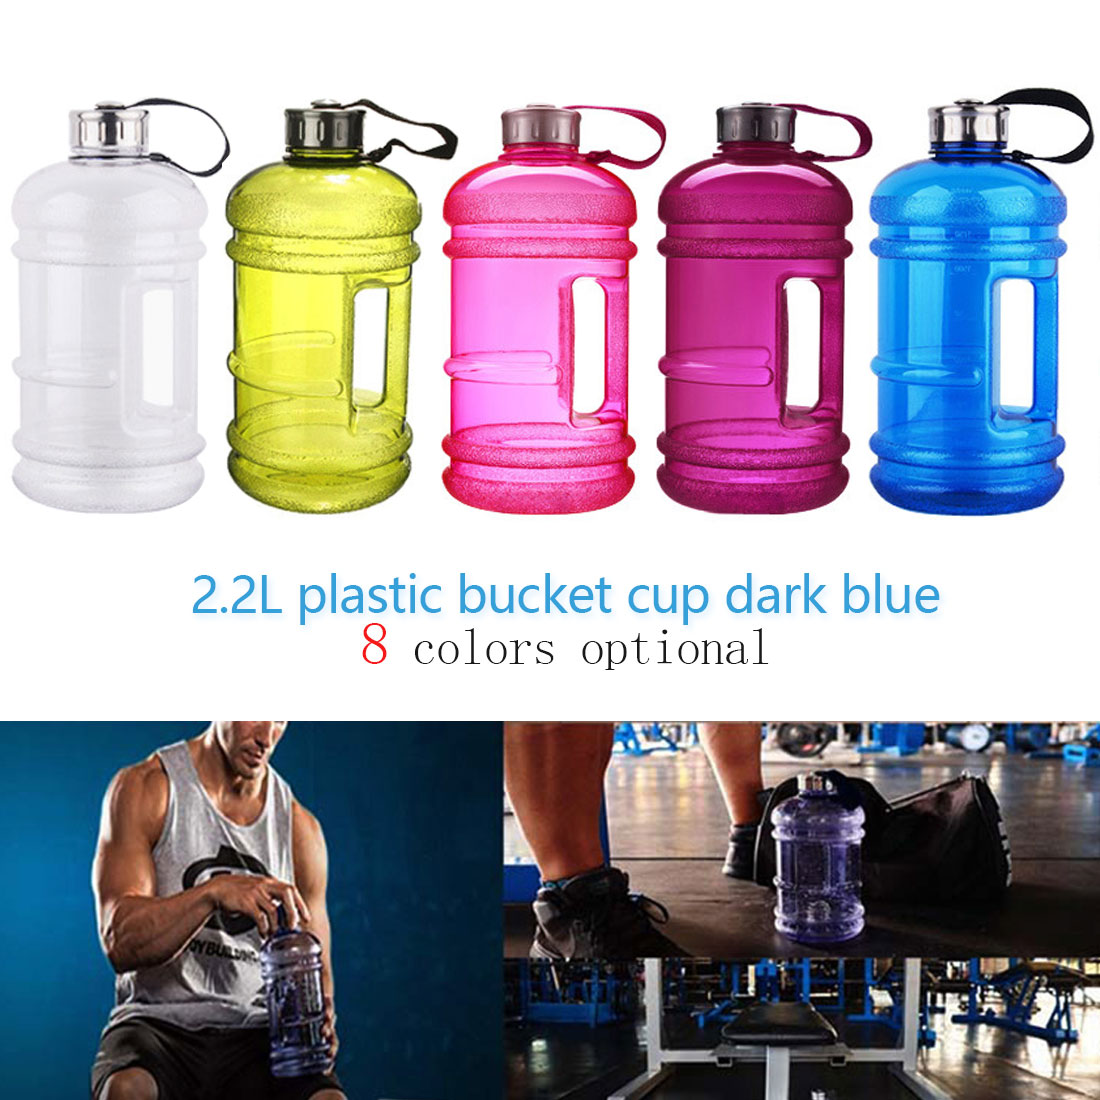 Pop On // Off Lid Large Water Bottle 2.2L Peak Supps Pop Cap Jug BPA FREE